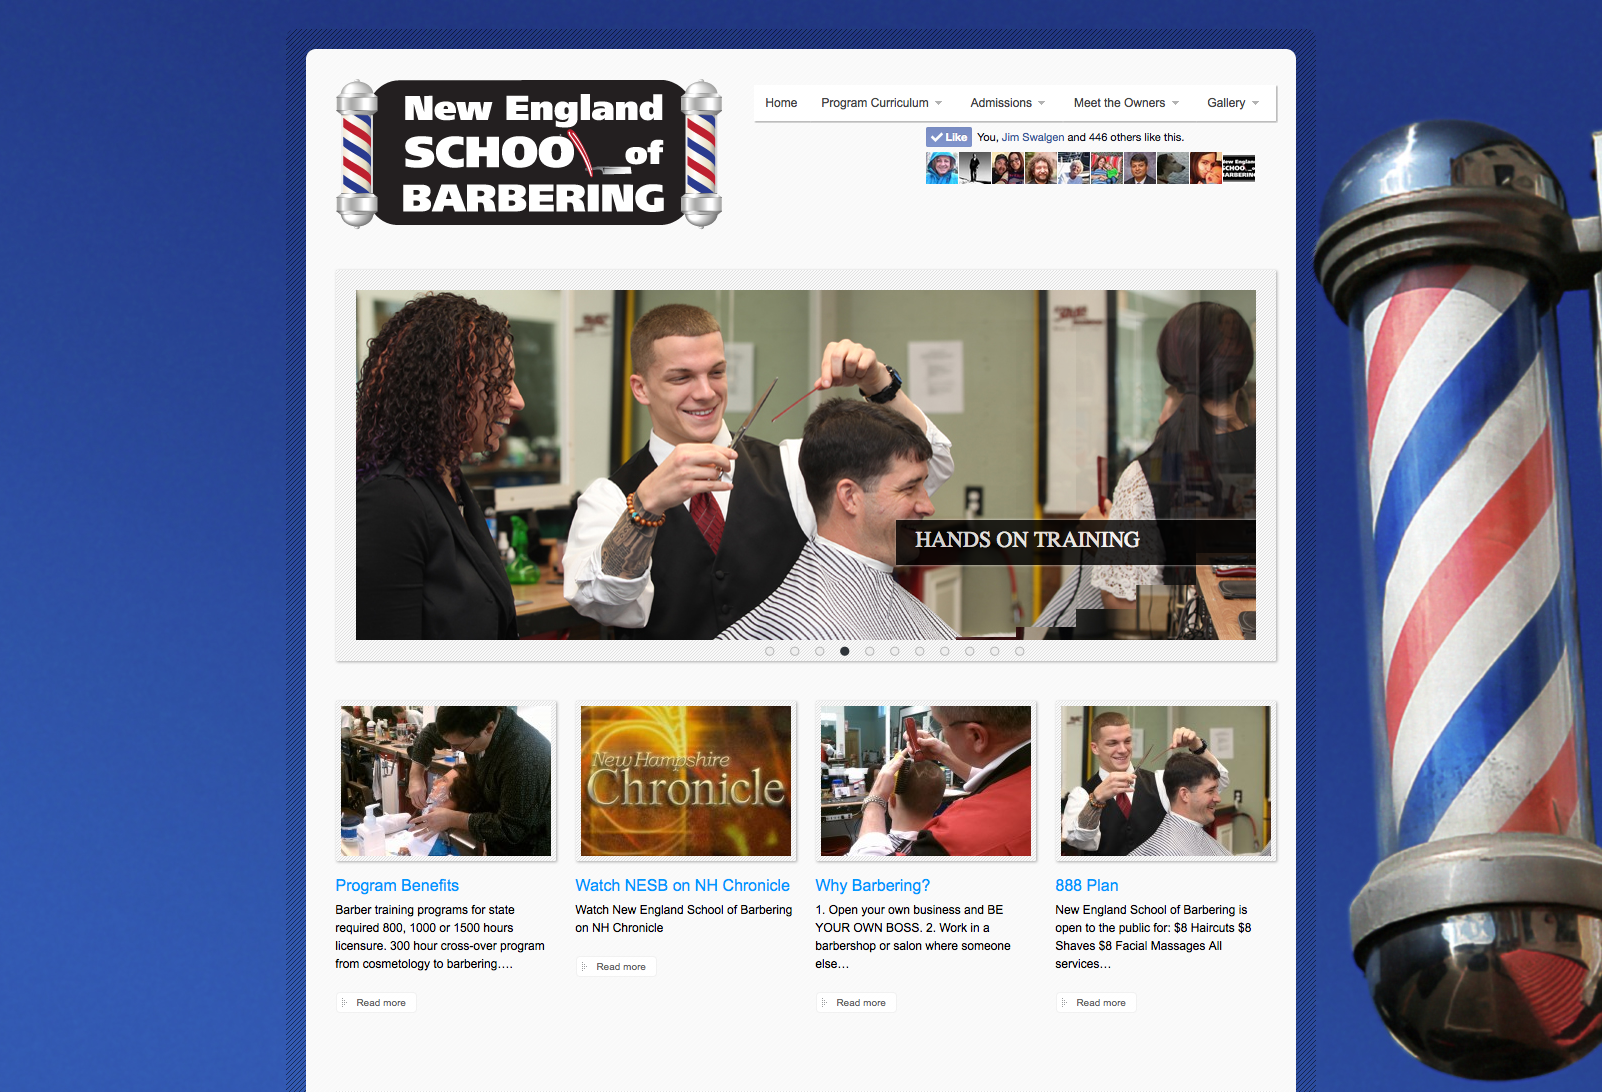 New England School of Barbering